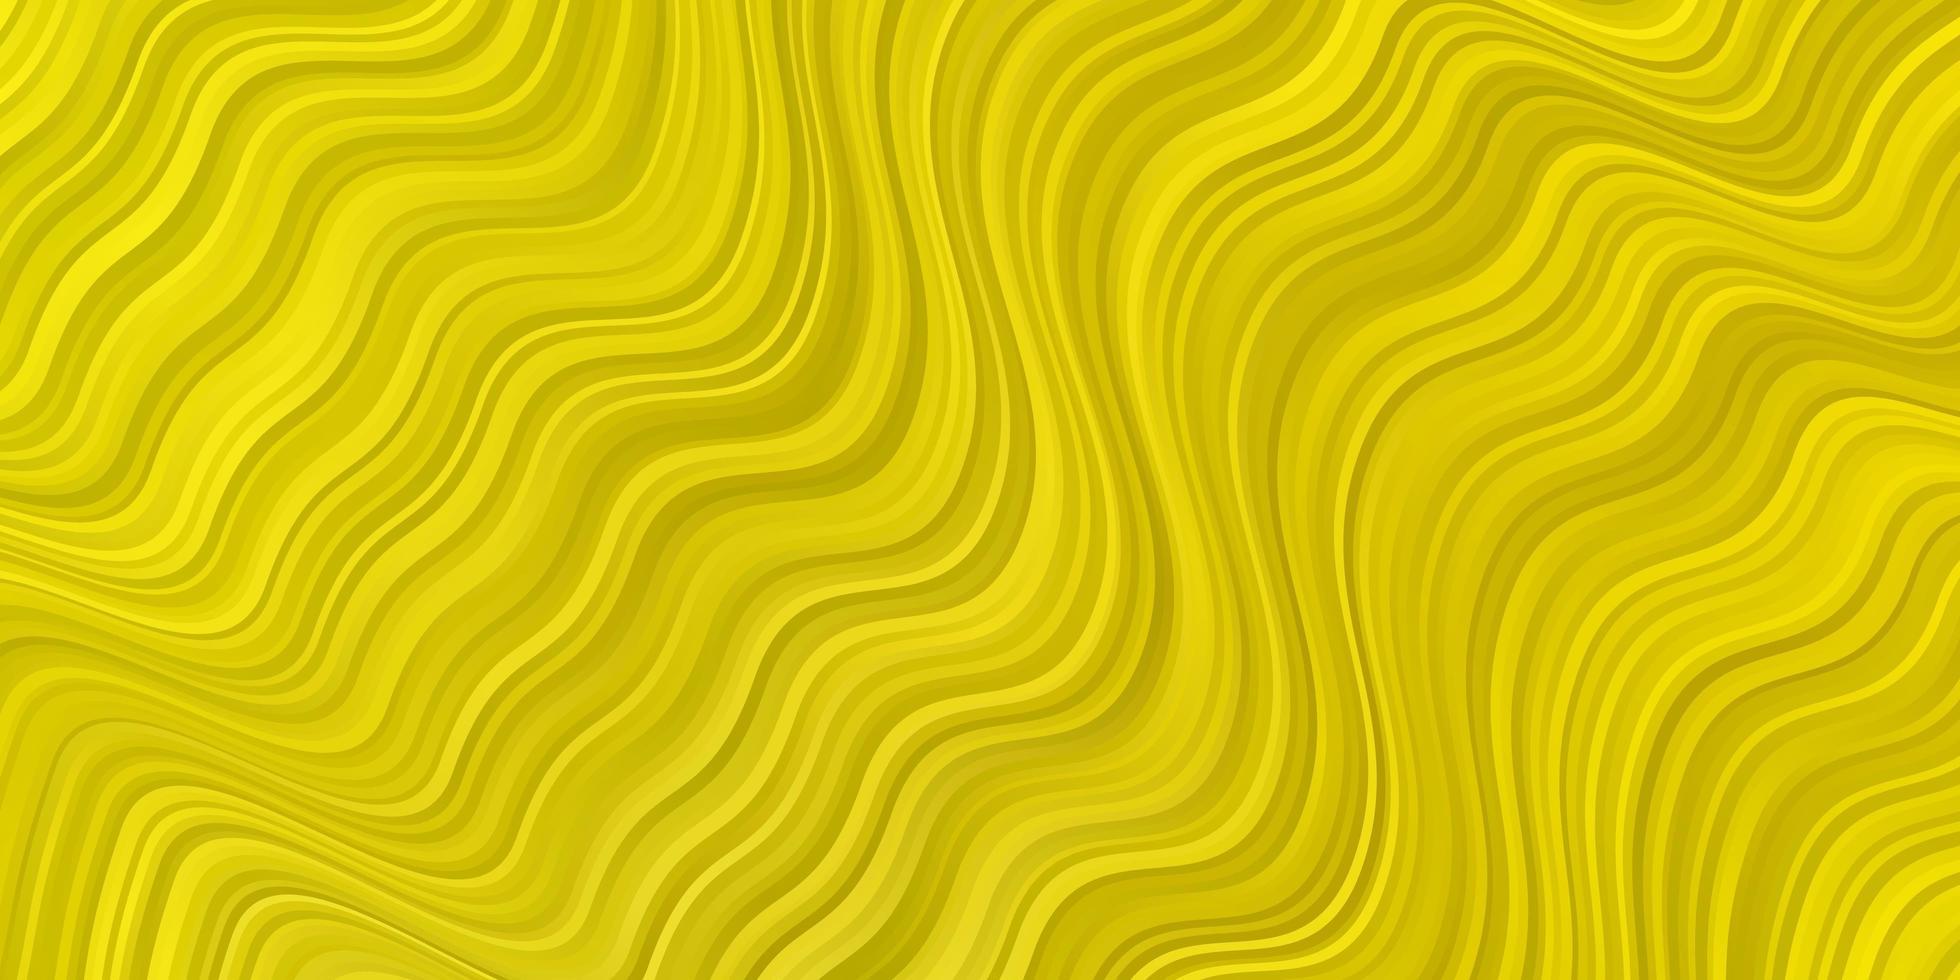 textura de vetor amarelo claro com curvas.